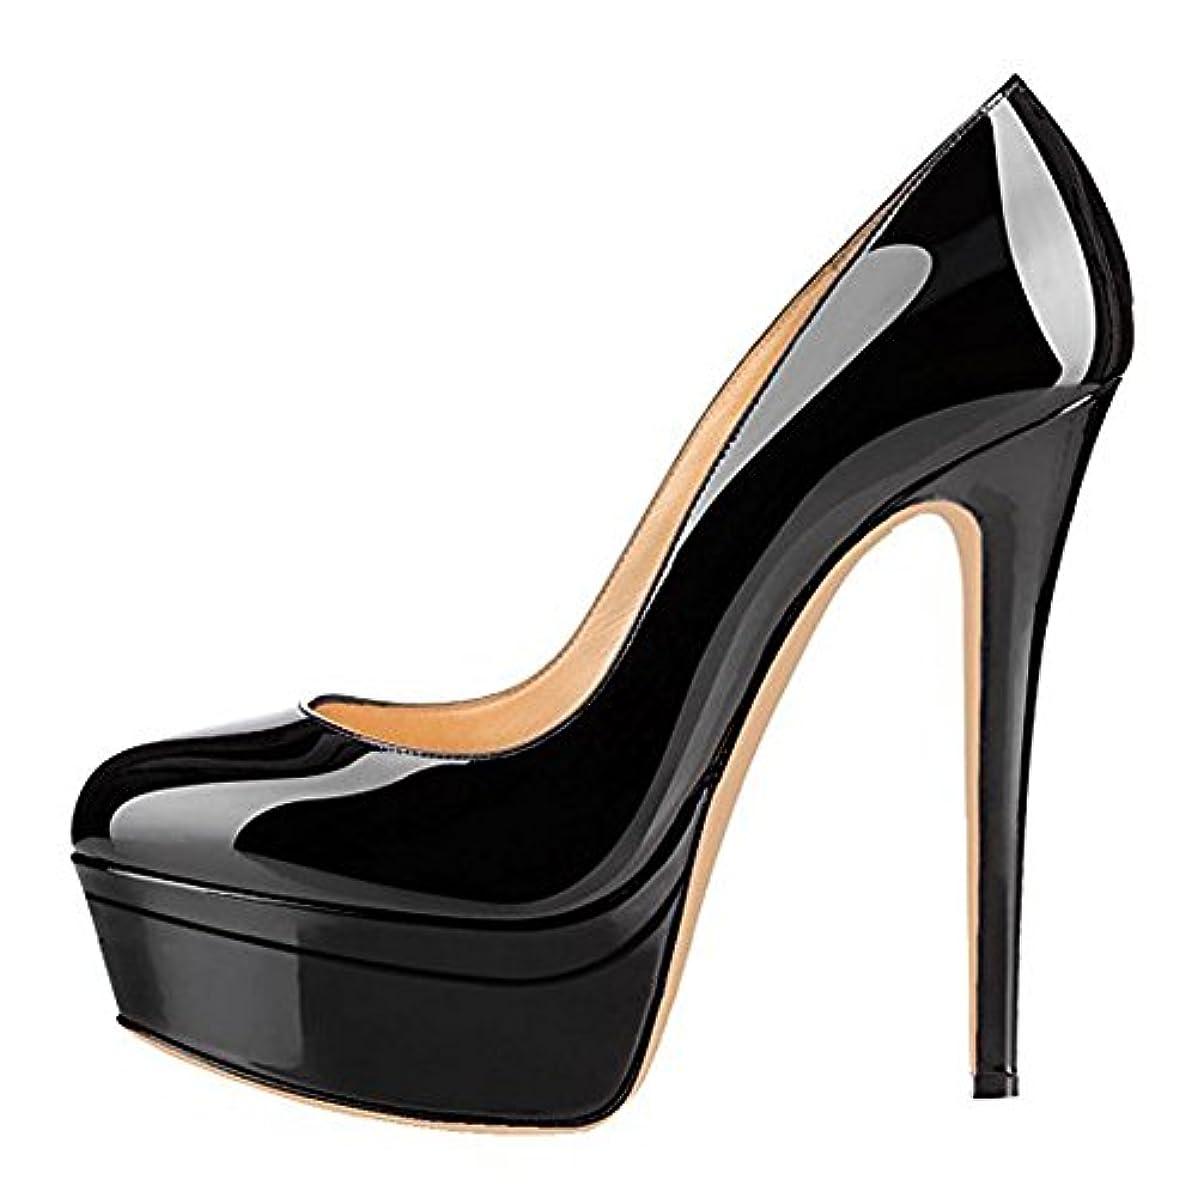 Onlymaker Women's Round Toe Super High Heel Platform Stiletto Slip On Pumps for Wedding Party Shoes